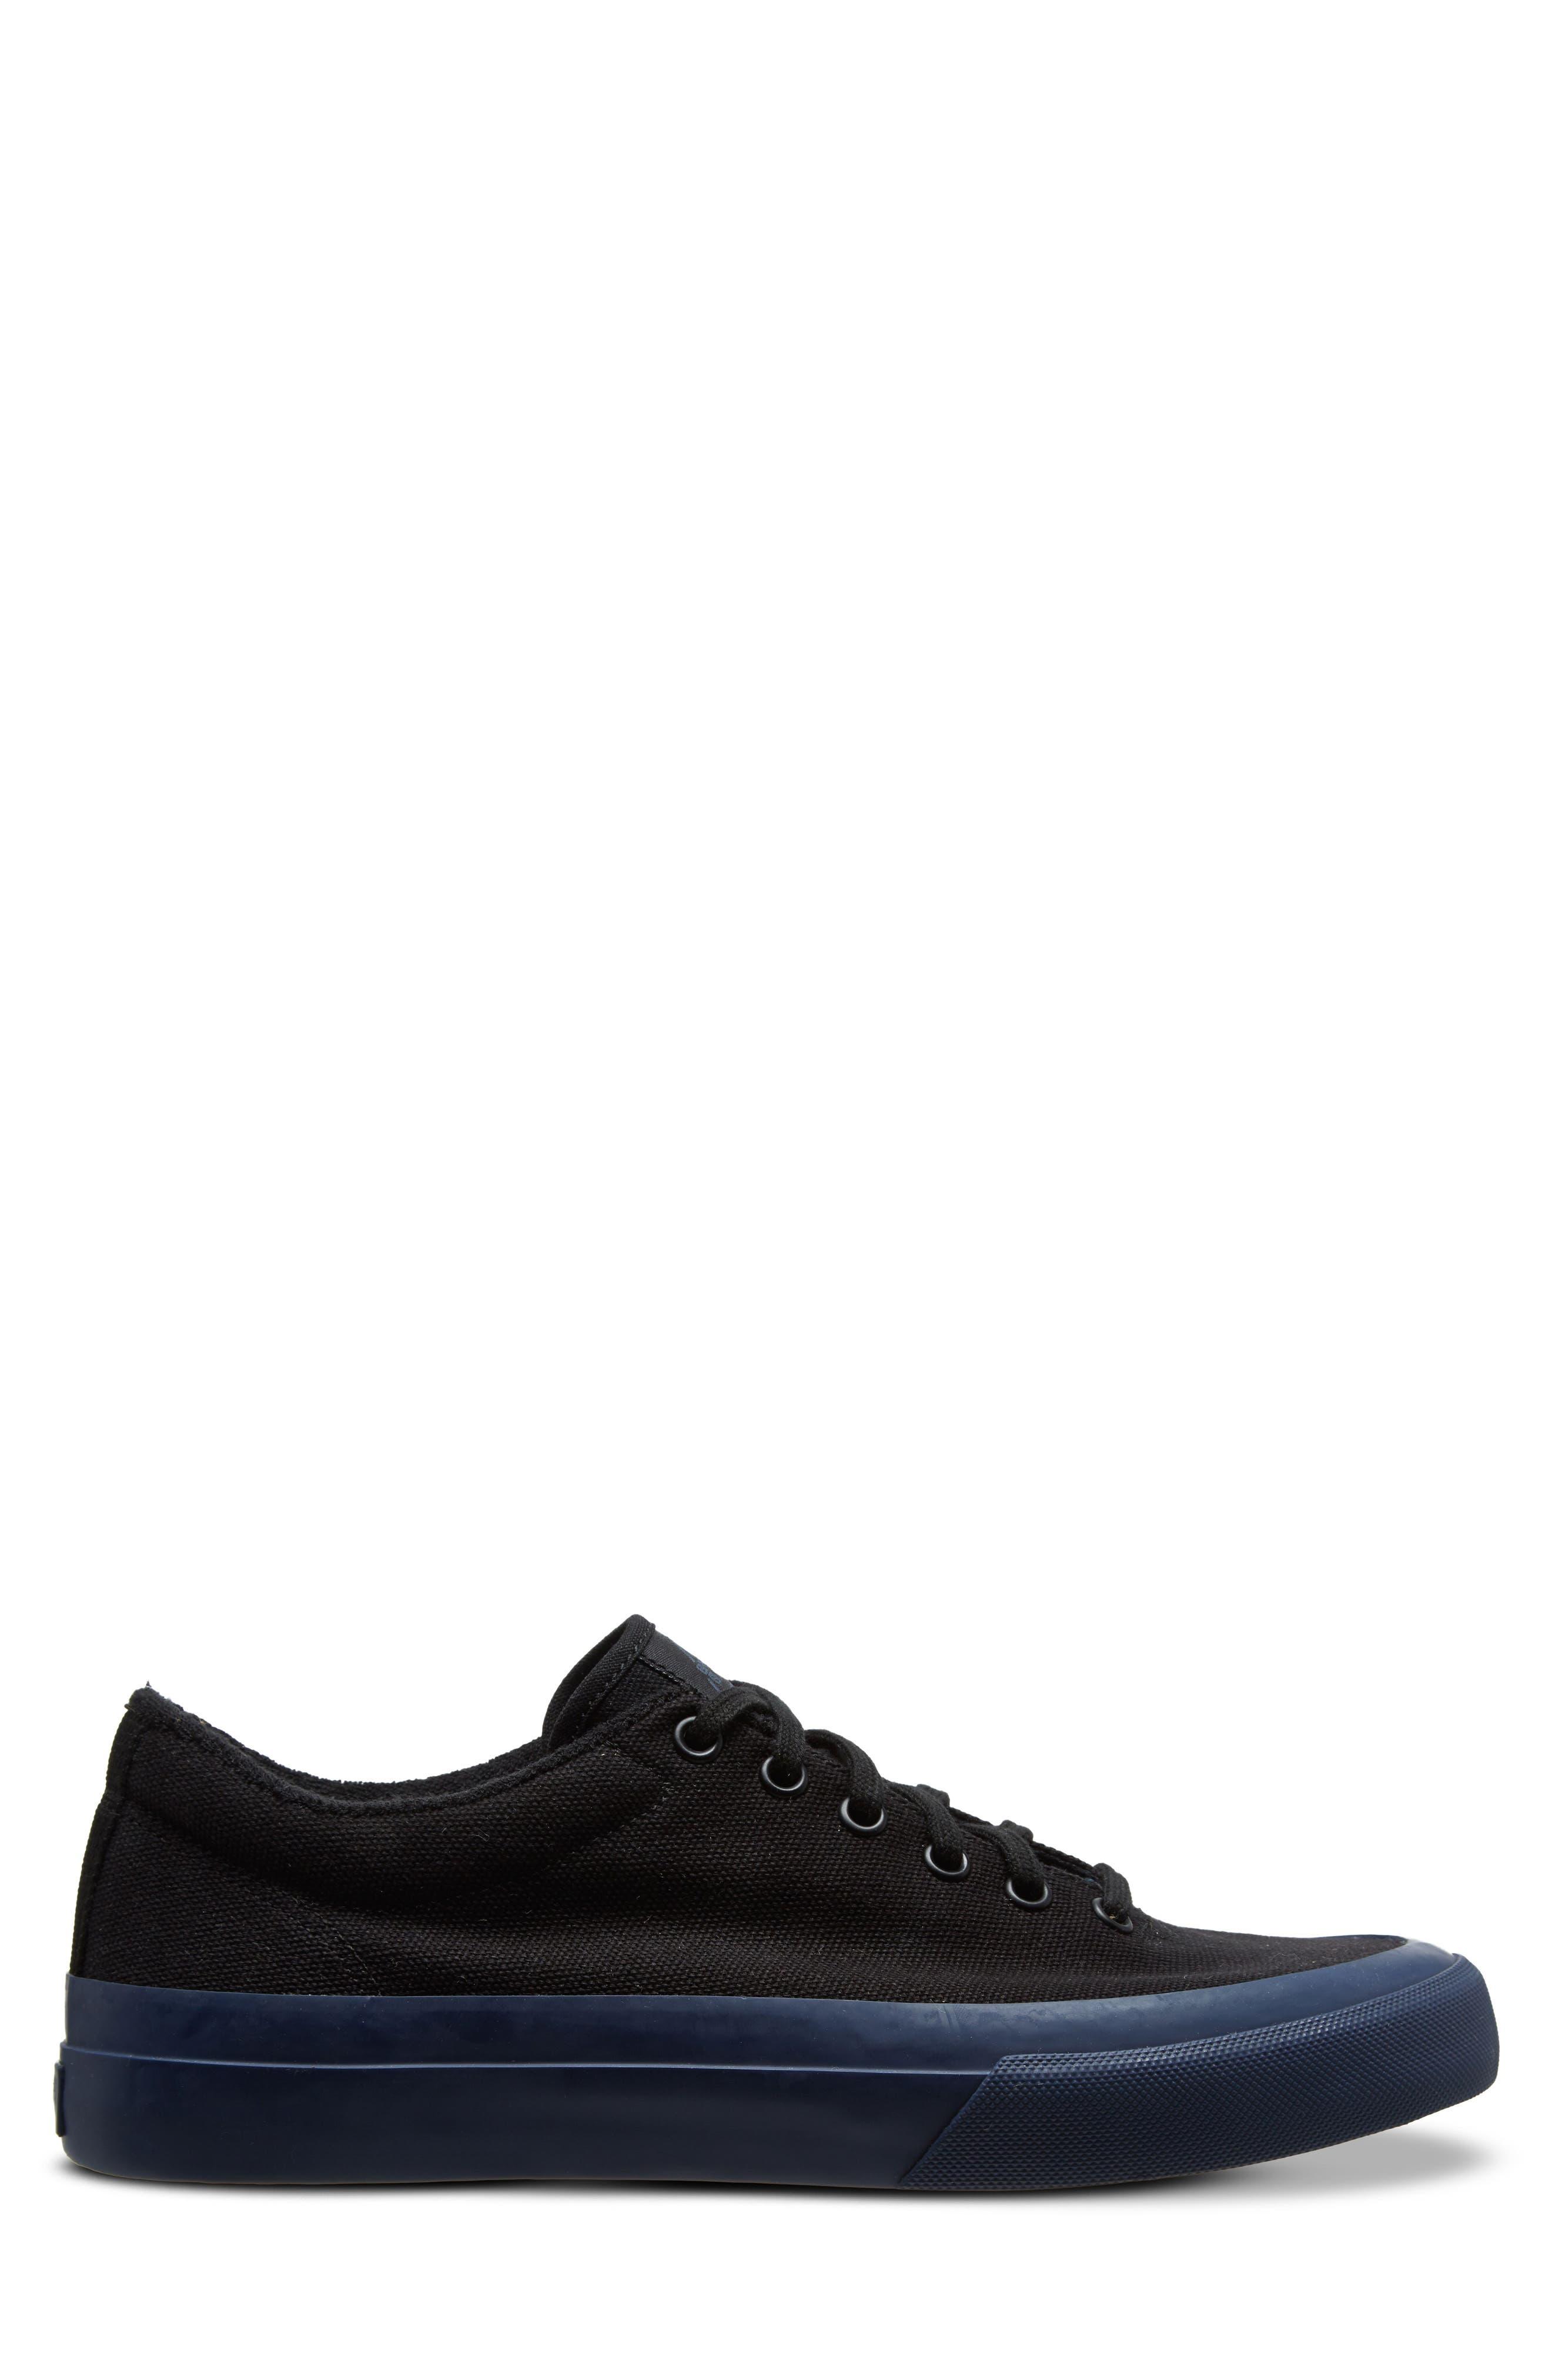 Vesta Low Top Sneaker,                             Alternate thumbnail 3, color,                             BLACK/ NAVY